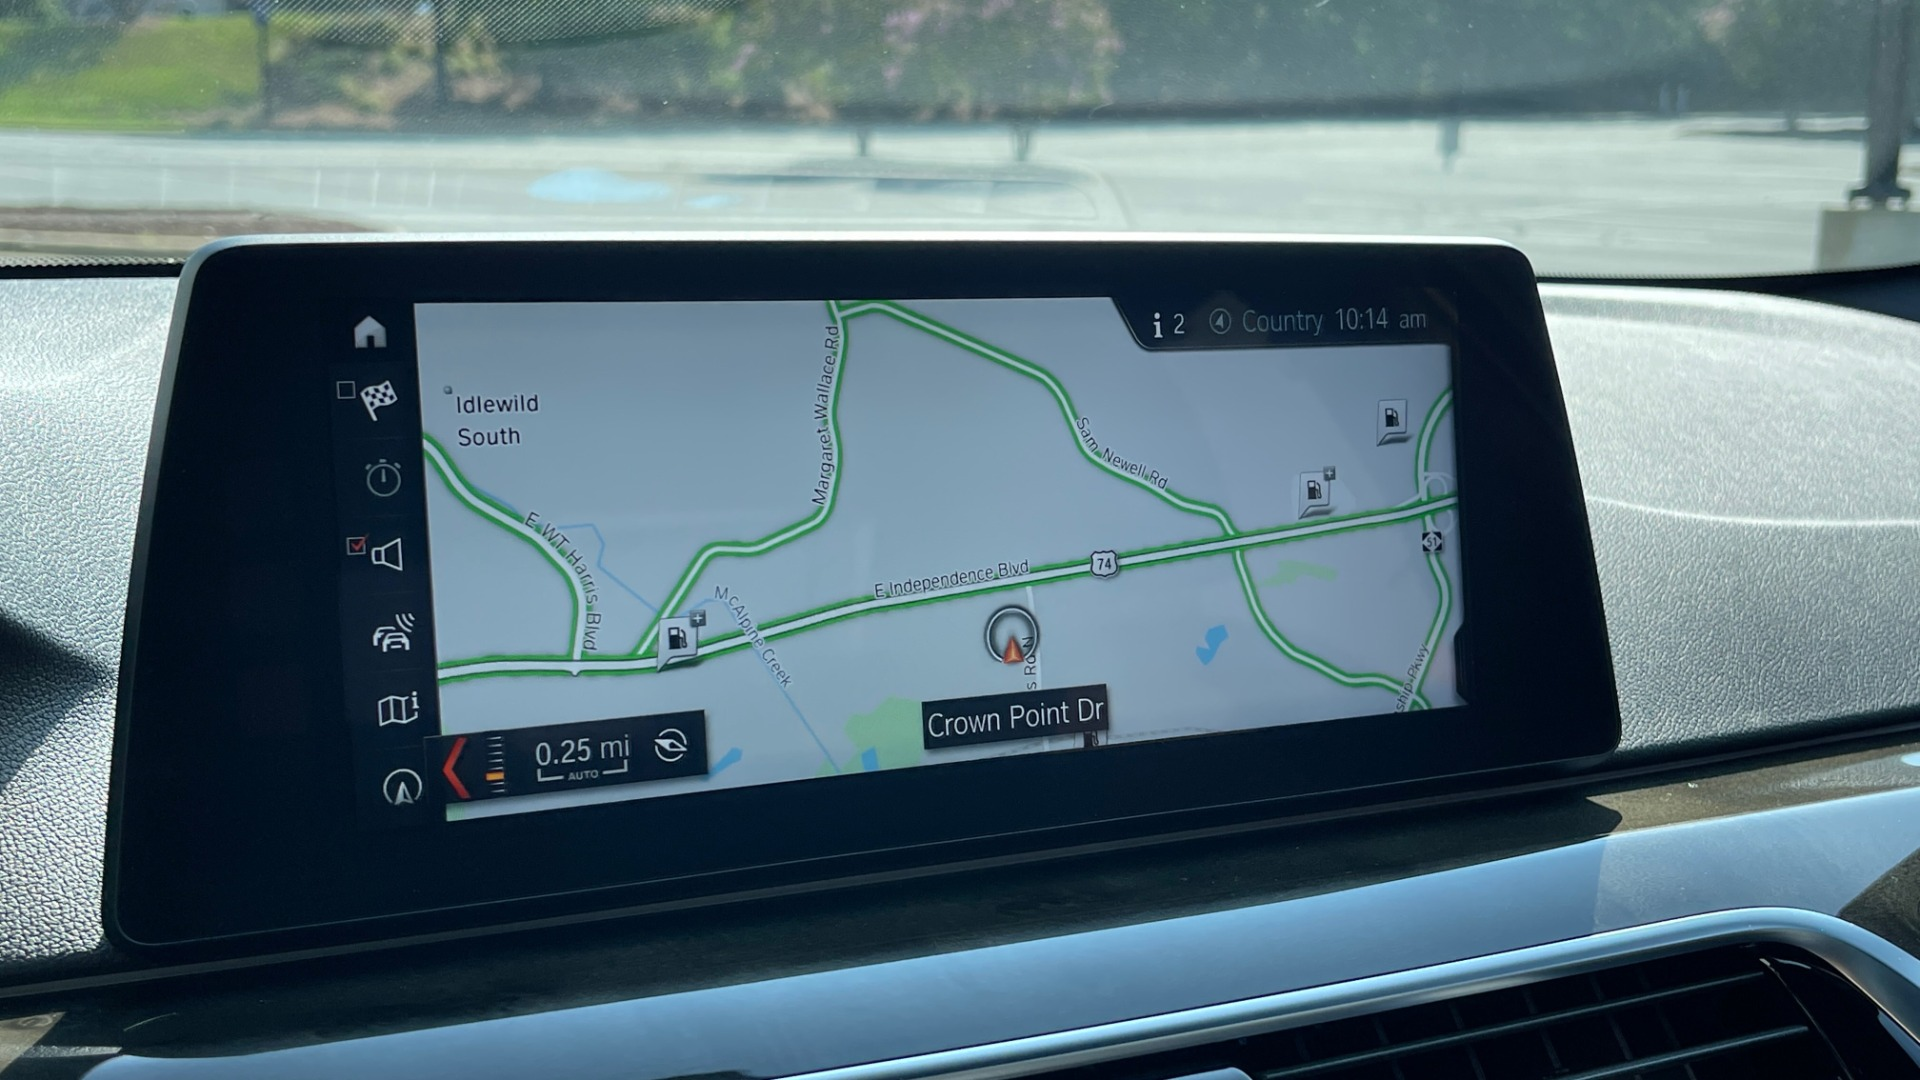 Used 2018 BMW 5 SERIES 540I XDRIVE M-SPORT / DRVR ASST / PDC / APPLE / HUD / H/K SND for sale $42,795 at Formula Imports in Charlotte NC 28227 45